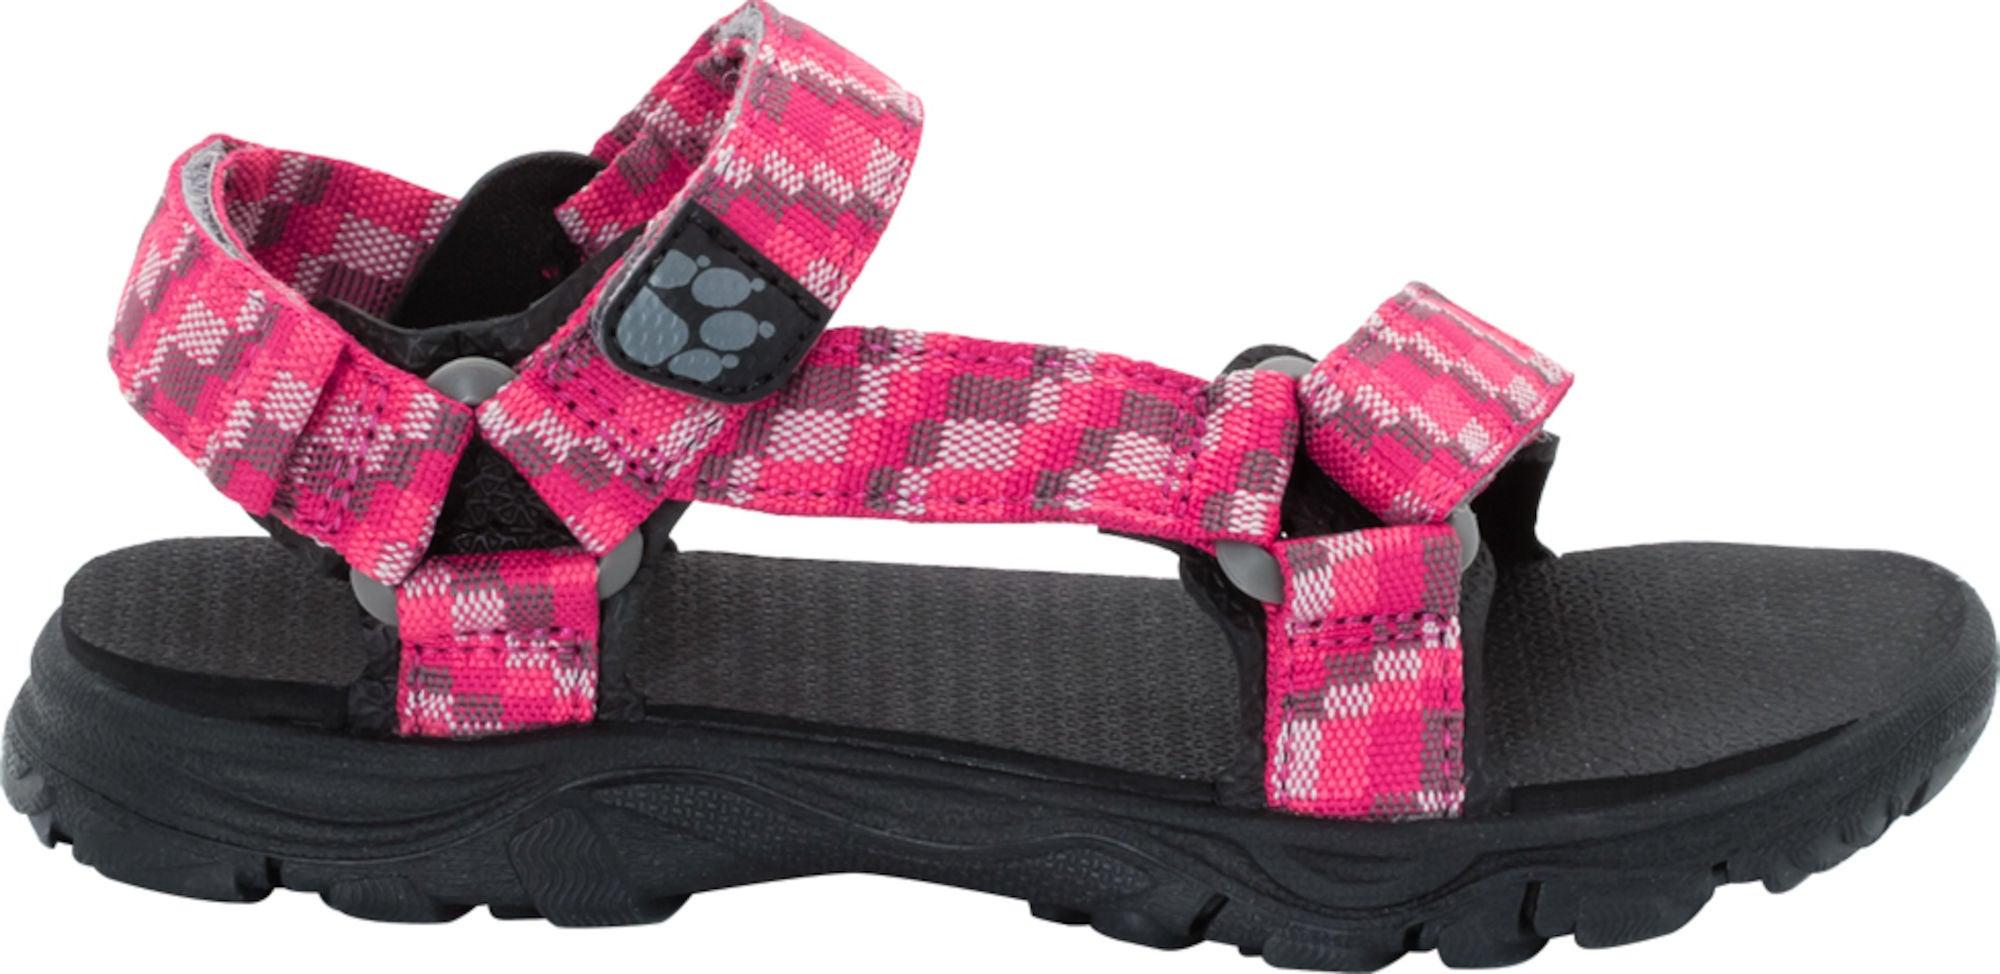 Jack Wolfskin Seven Seas Sandal, Tropic Pink 29